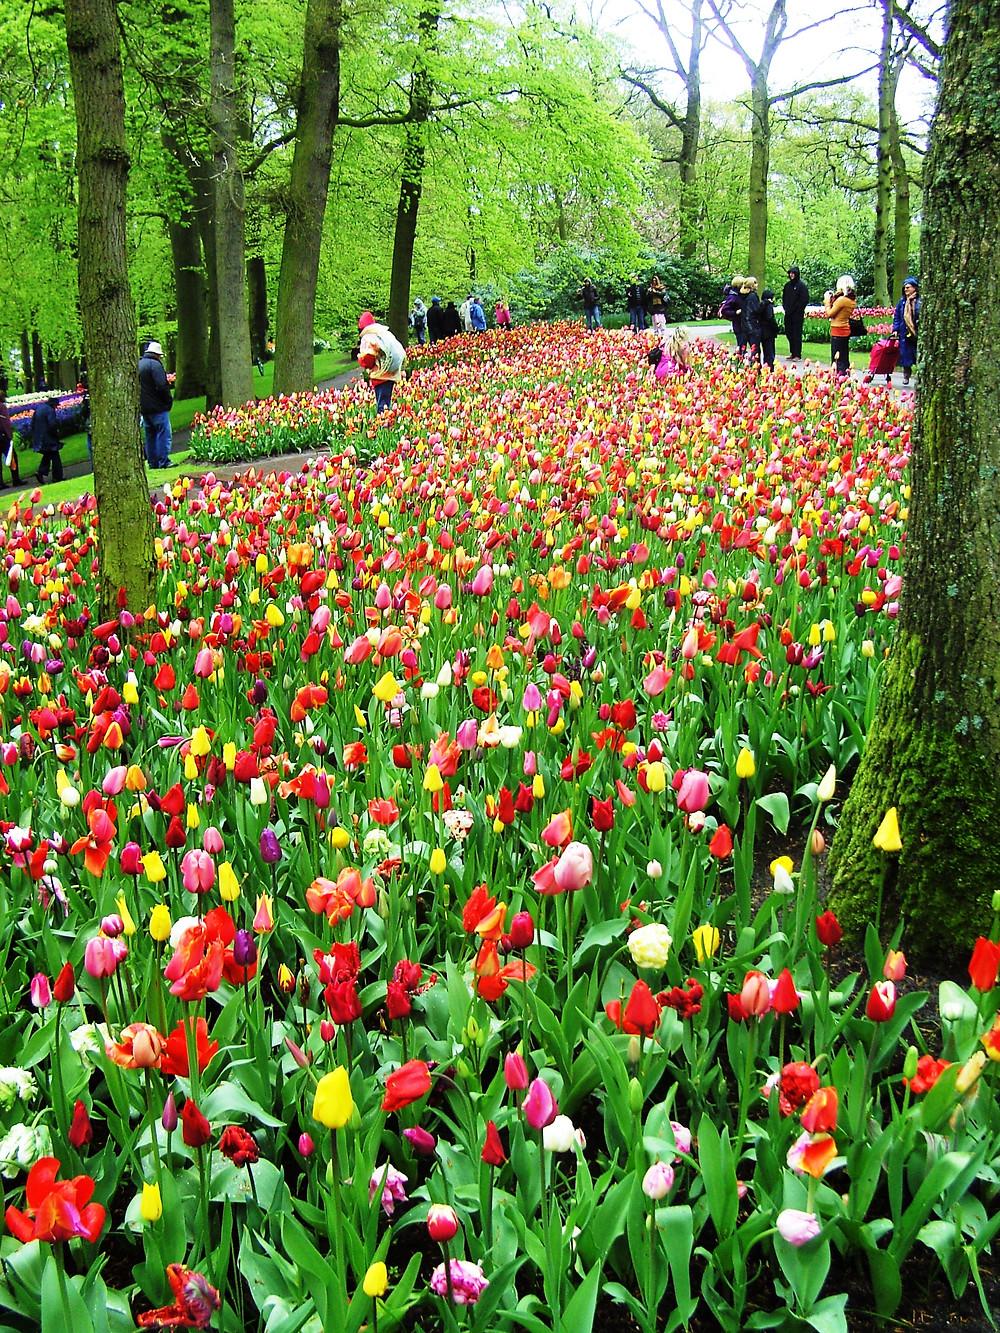 Mass planting of tulips at Keukenhof Gardens, Netherlands